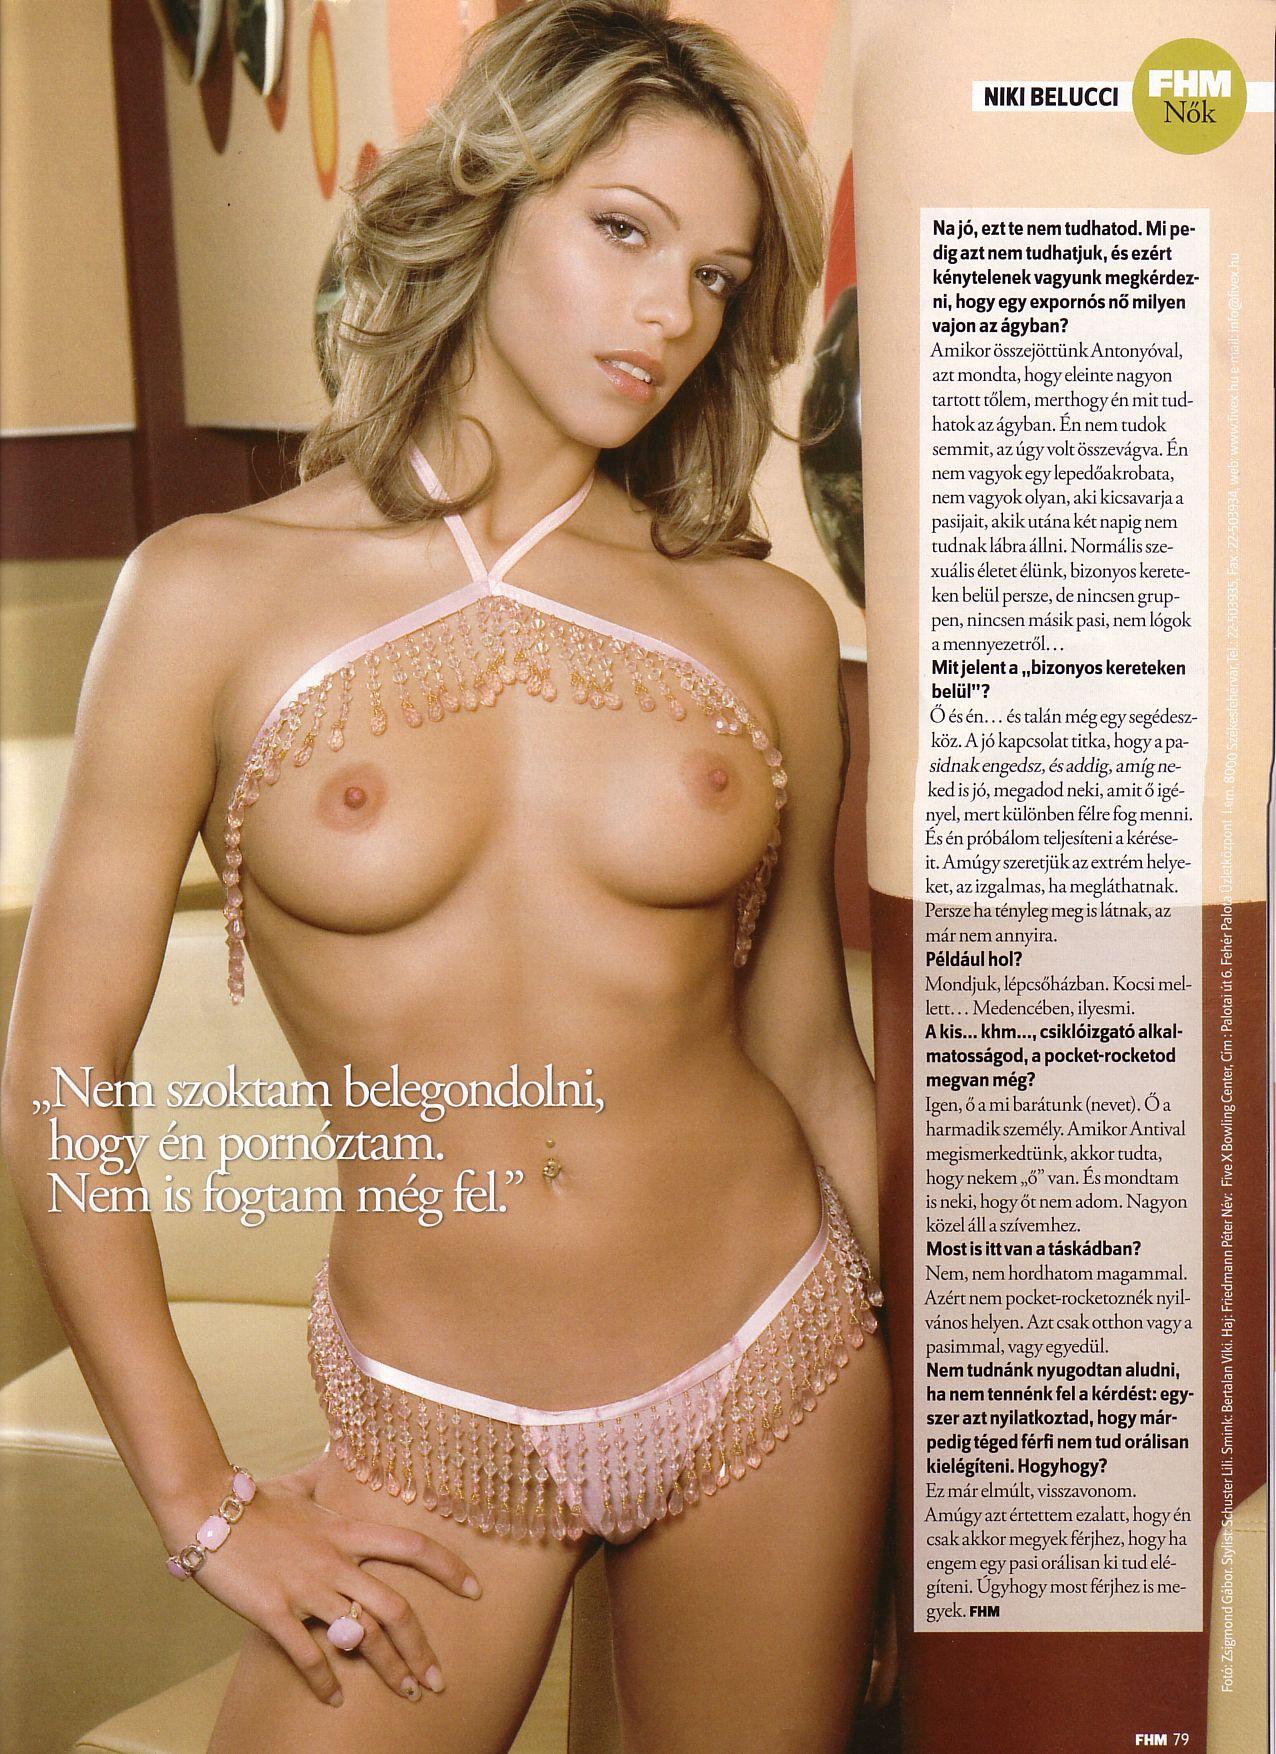 38202_nikki_belucci_topless_dj_9_123_480lo.jpg